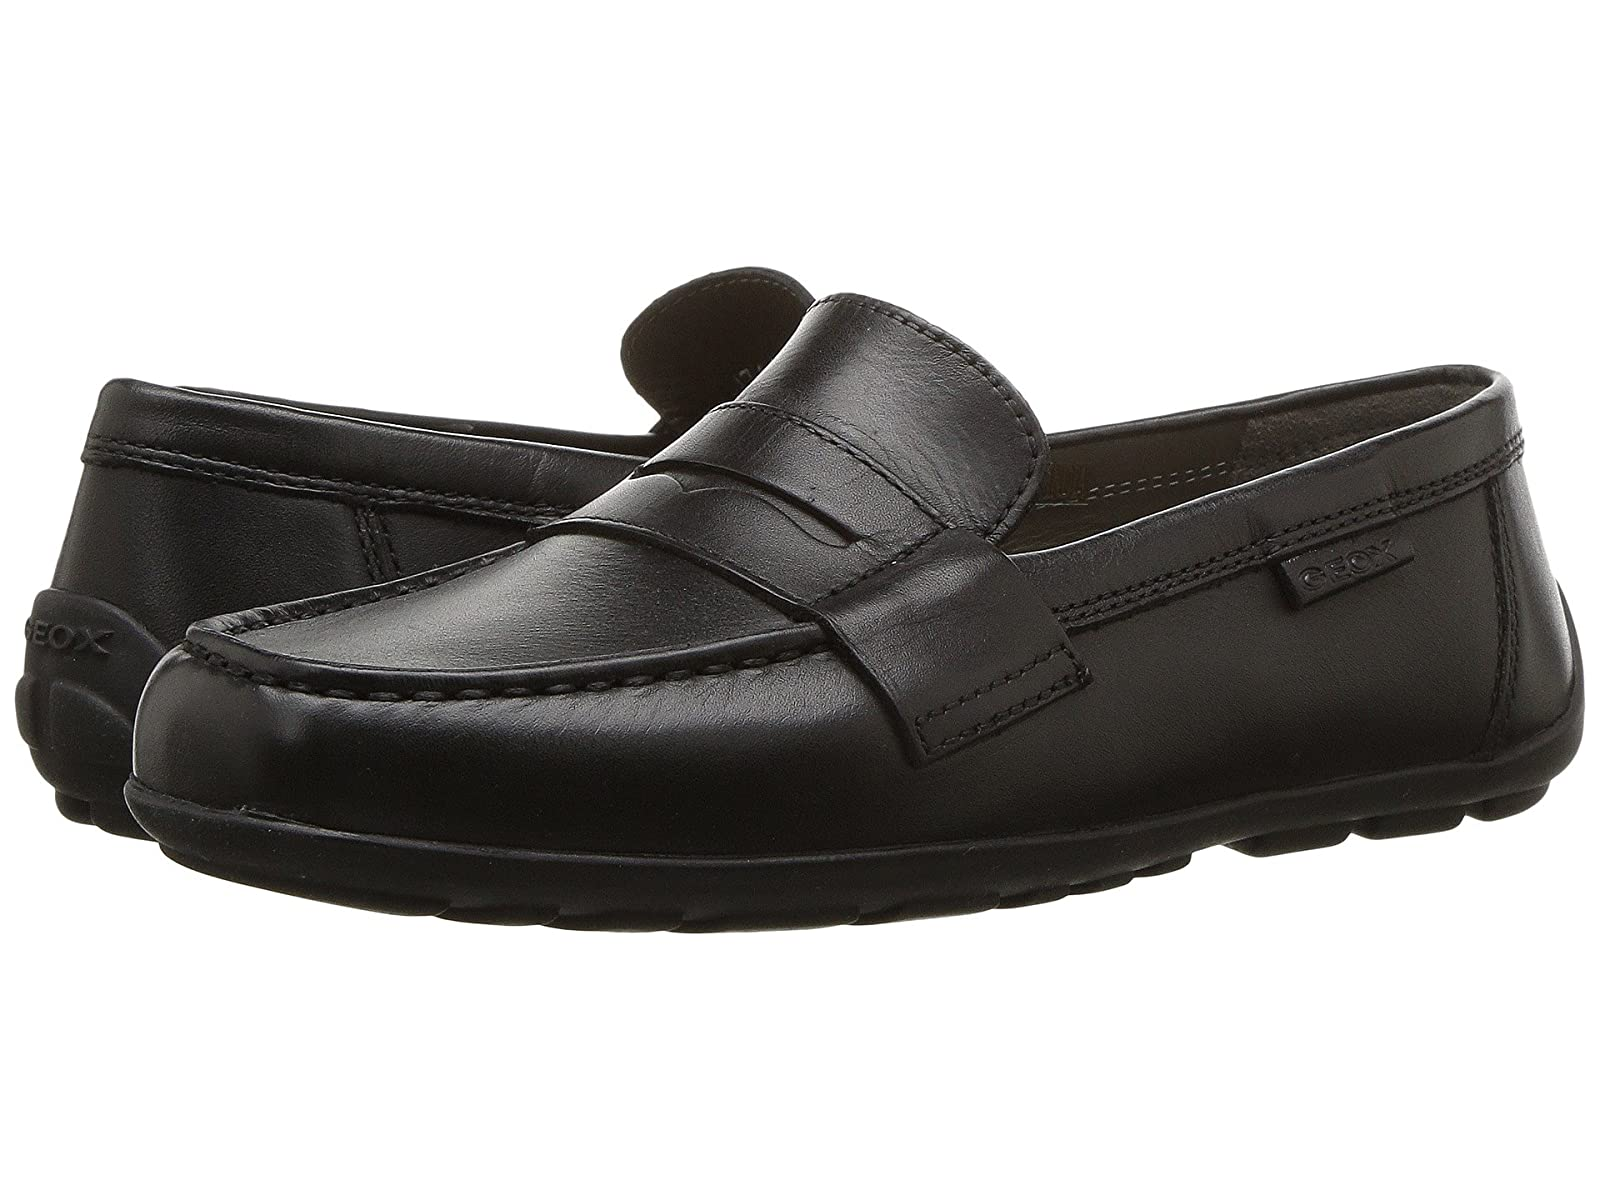 Geox Kids Jr Fast 1 (Big Kid)Atmospheric grades have affordable shoes